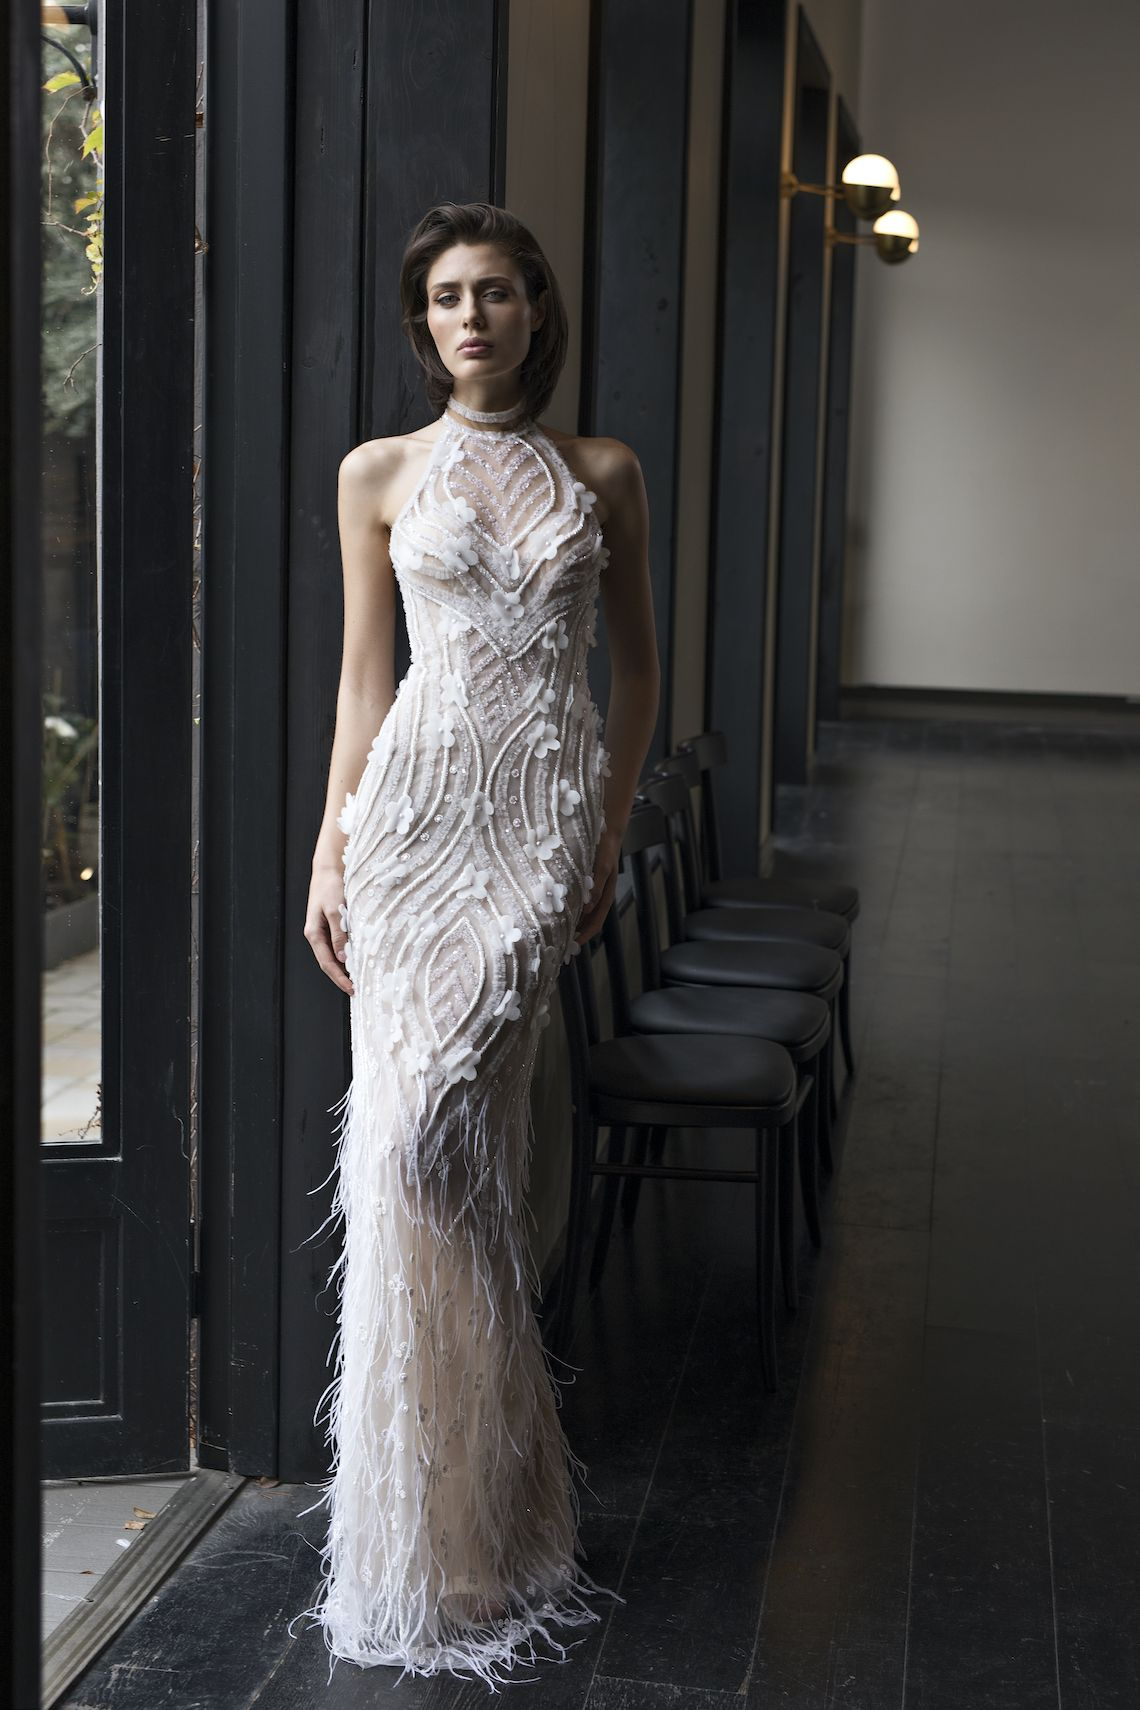 Florence riki dalal wedding dress collection dress